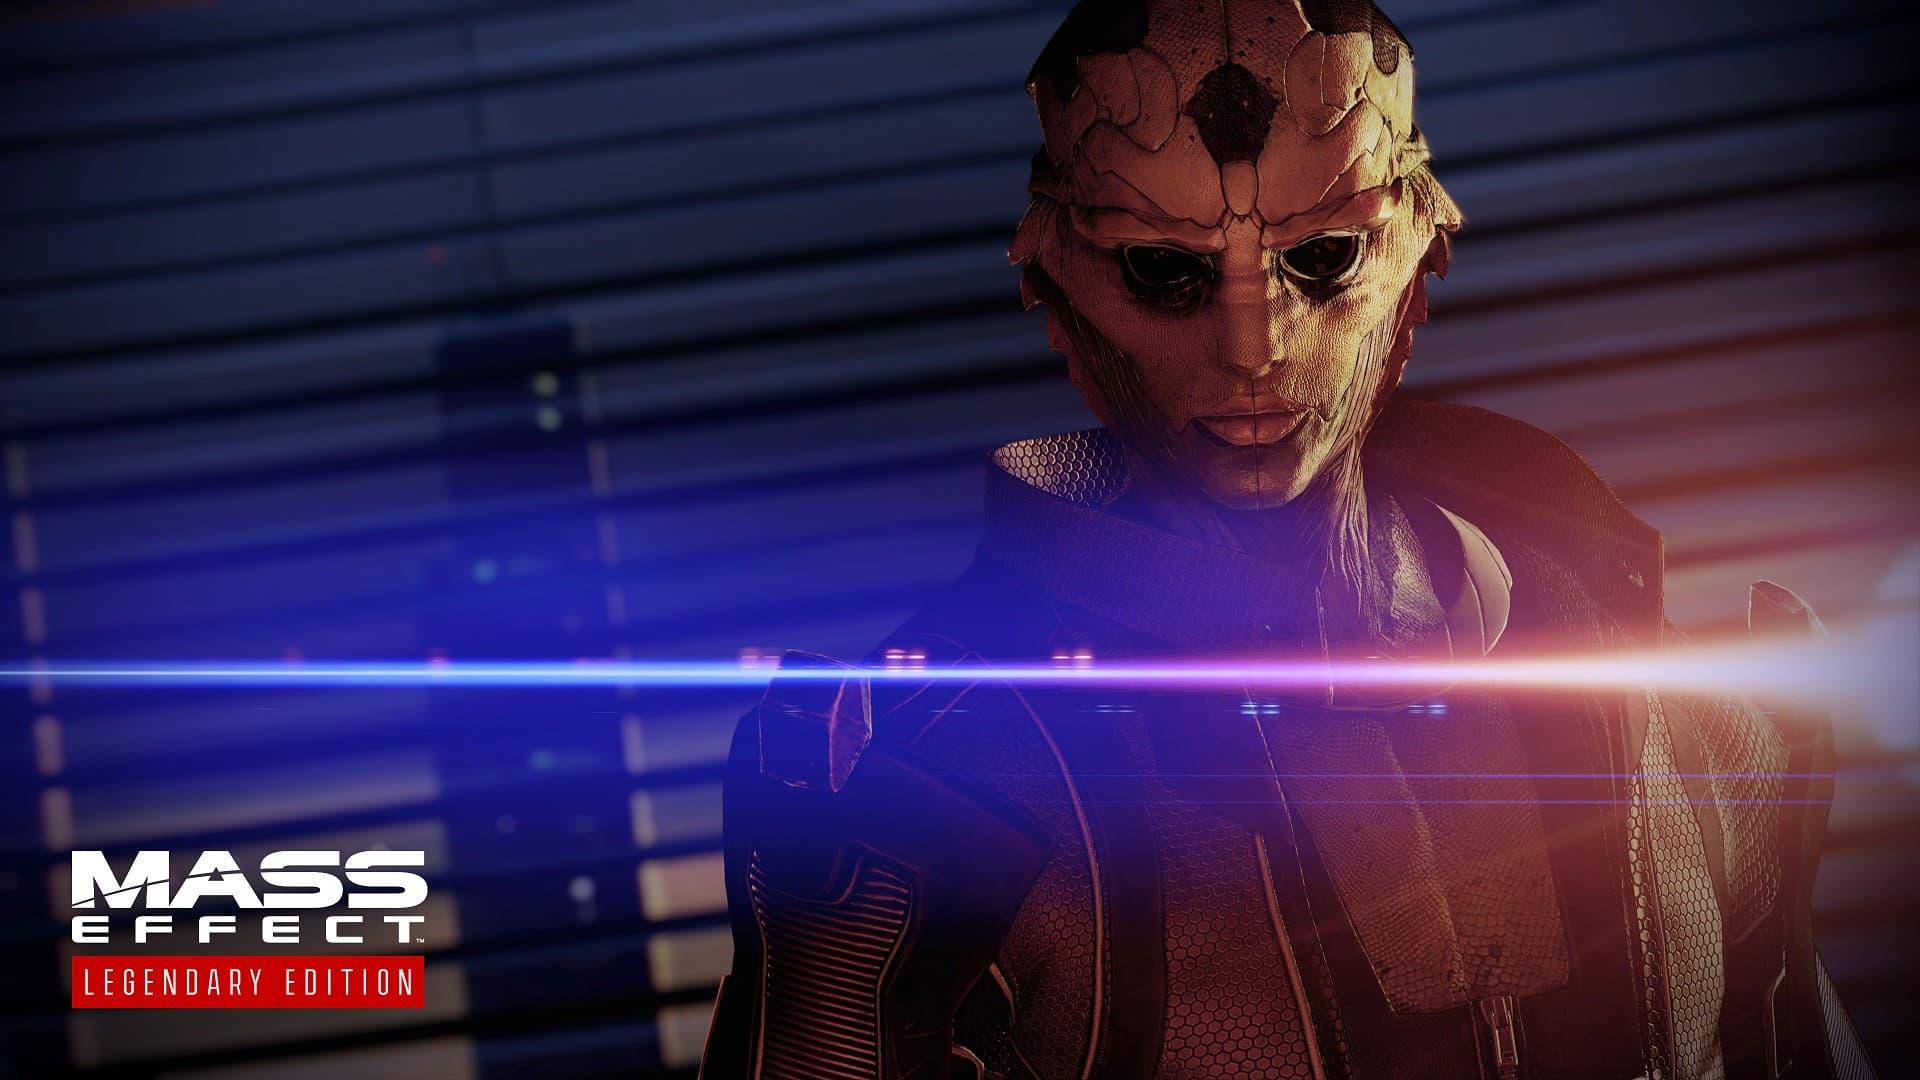 Xbox Series X & S Mass Effect: Legendary Edition